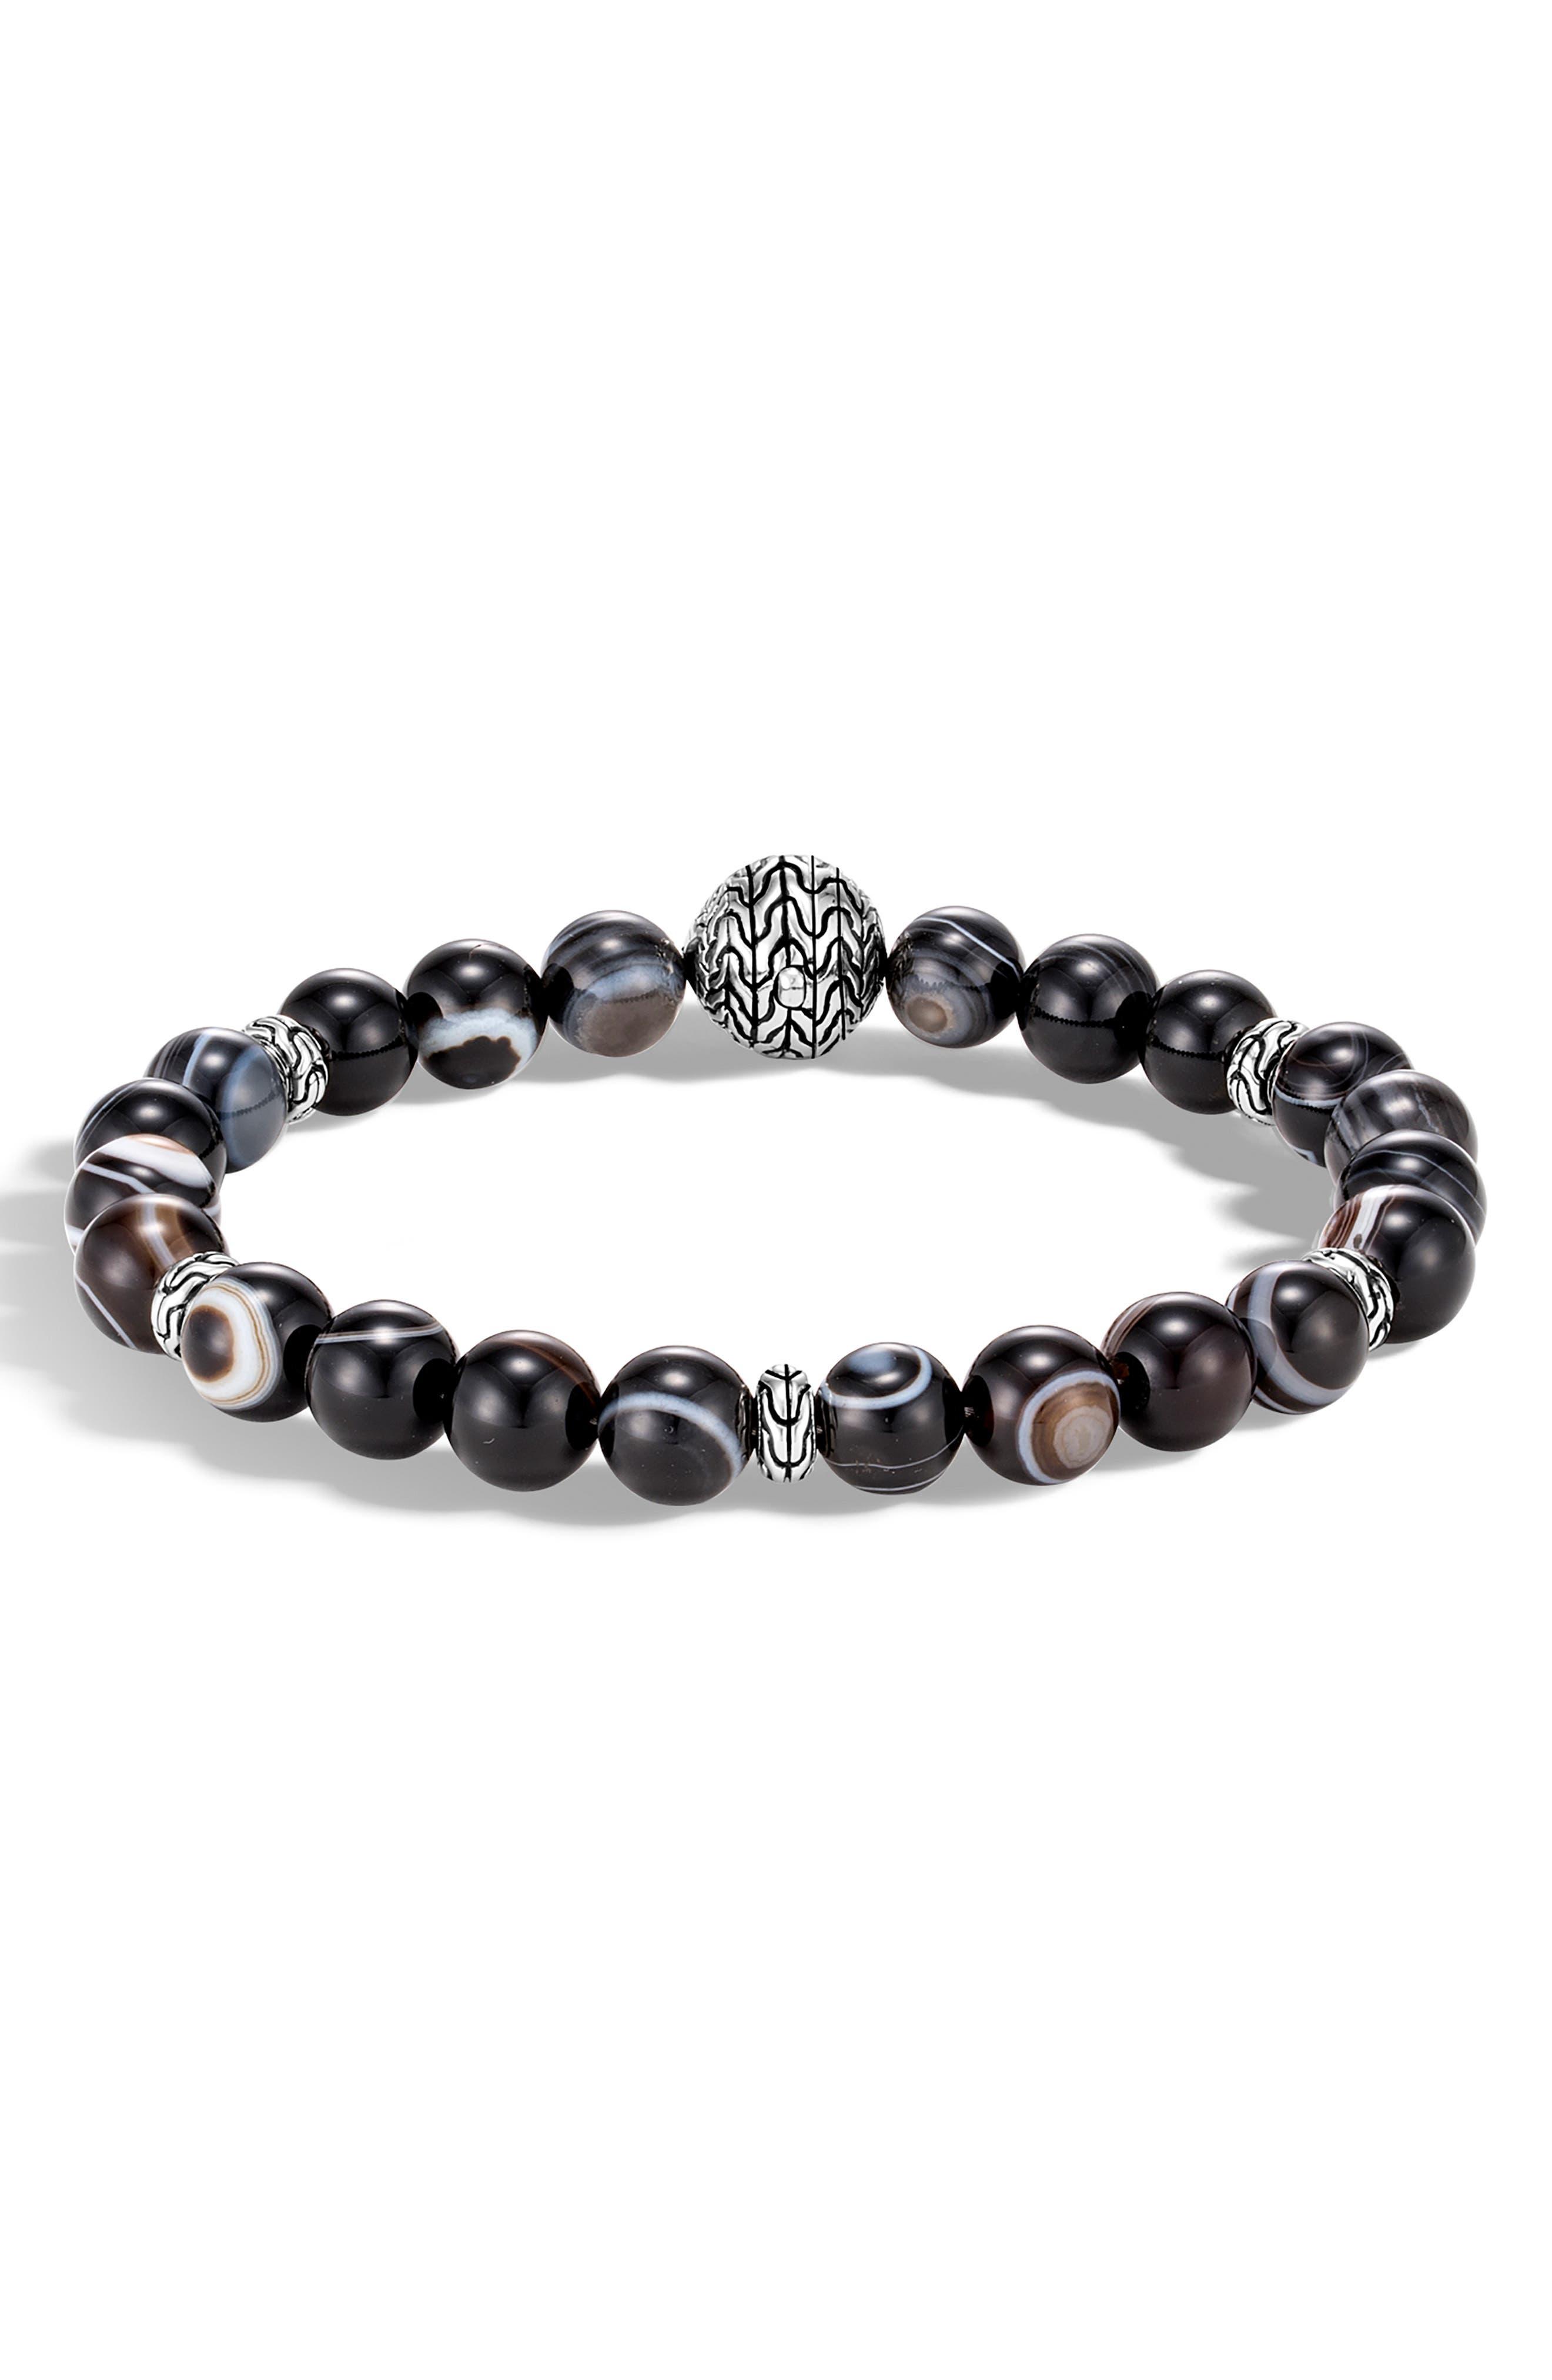 Men's Classic Chain Banded Agate Bracelet,                             Main thumbnail 1, color,                             SILVER/ SODALITE/ HEMATITE